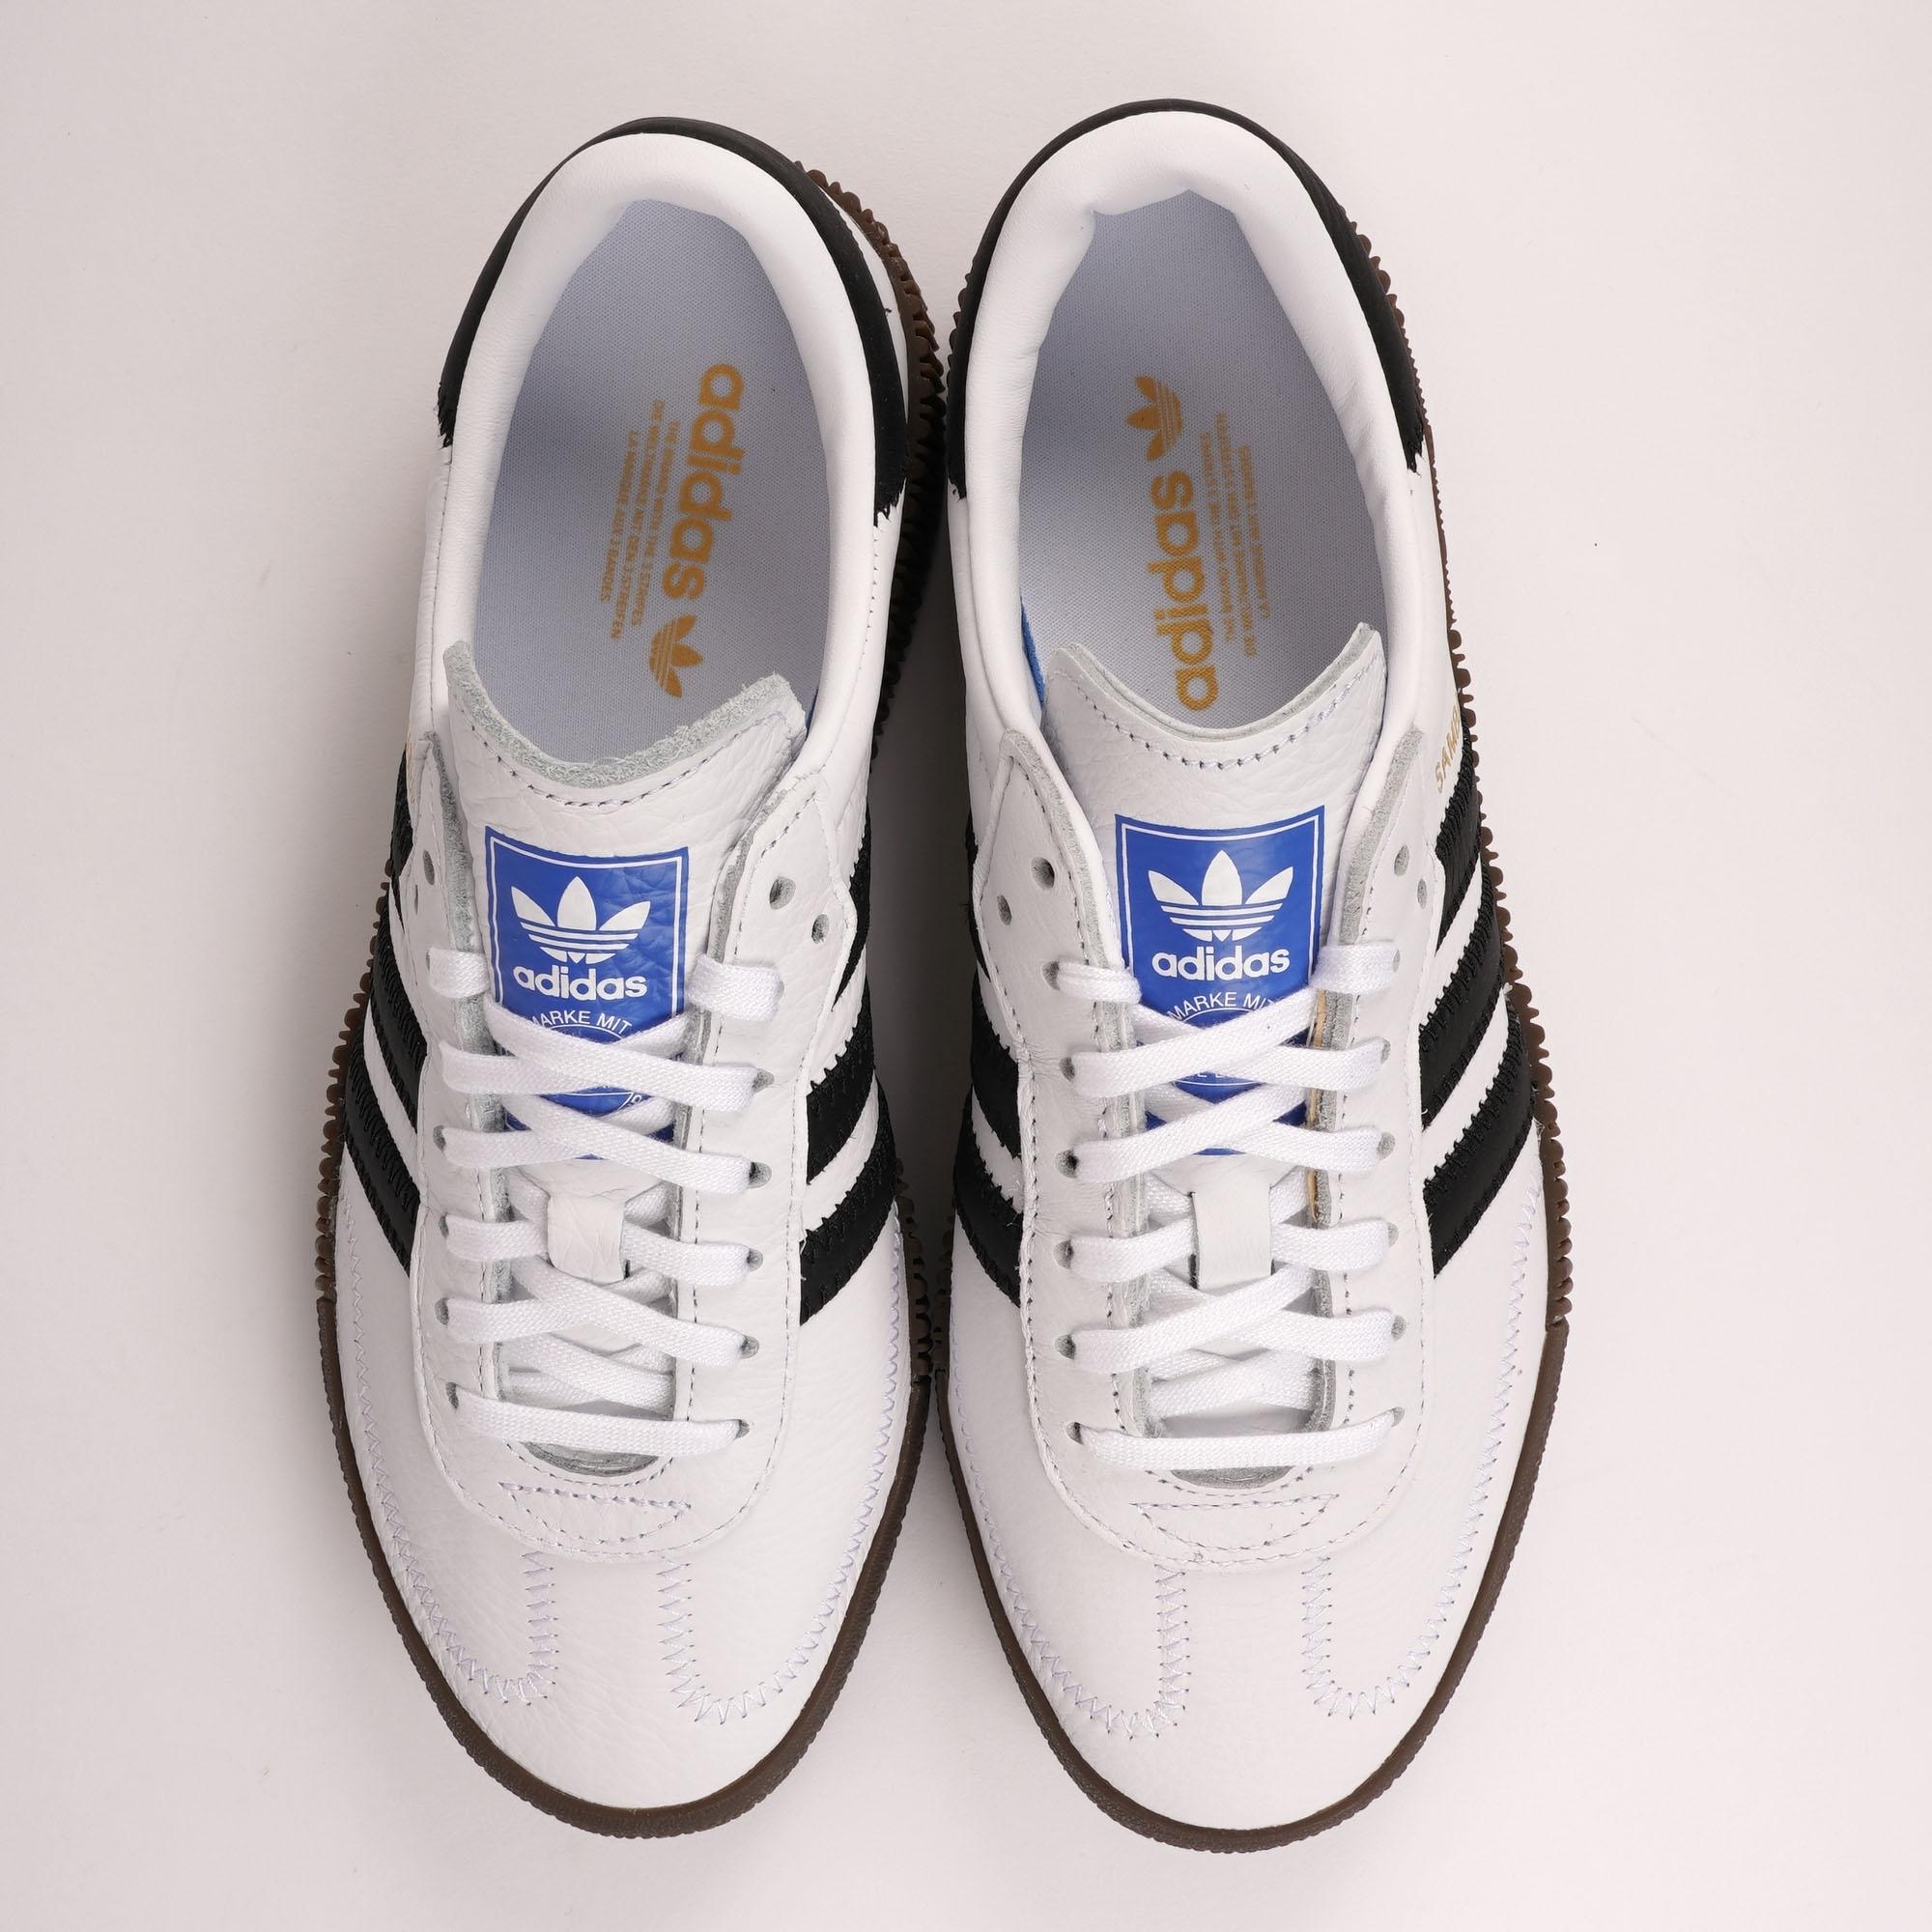 e7fe31bfc57 ... Women s Sneakers  Adidas Originals Womens Sambarose. Tap image to zoom.  Sambarose - FTWR White